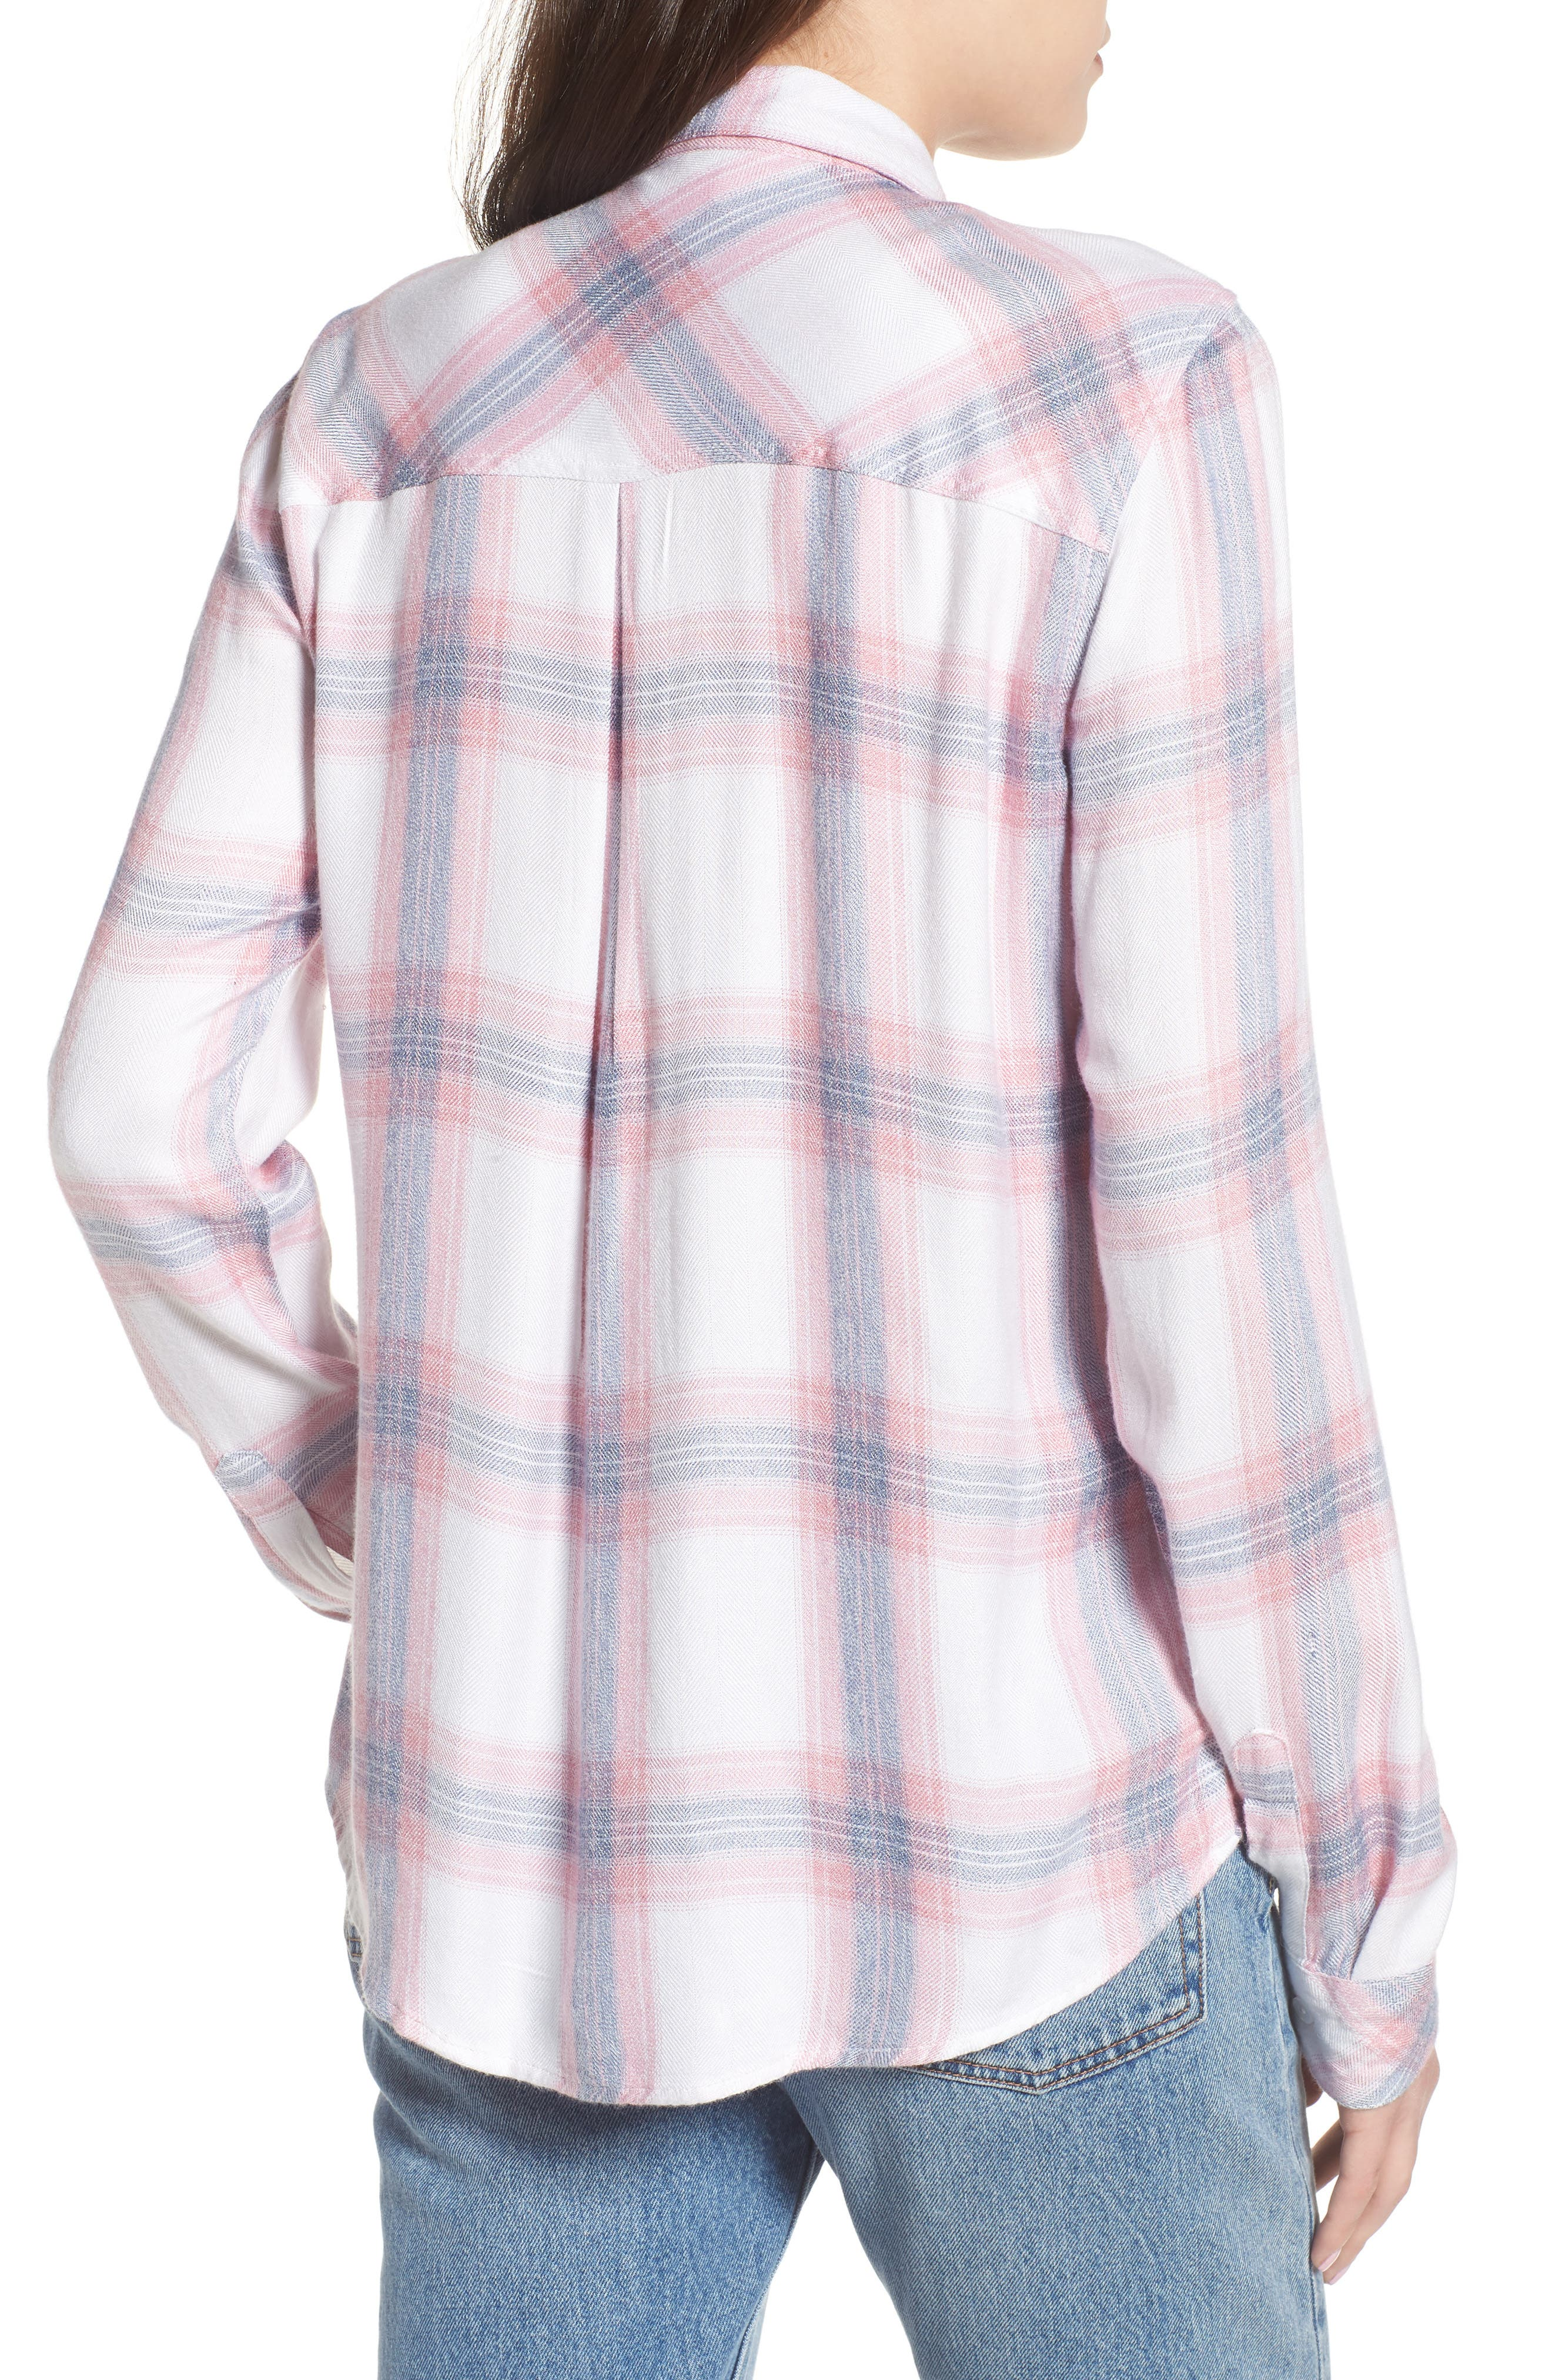 Carina Plaid Shirt,                             Alternate thumbnail 2, color,                             Red/ White Plaid